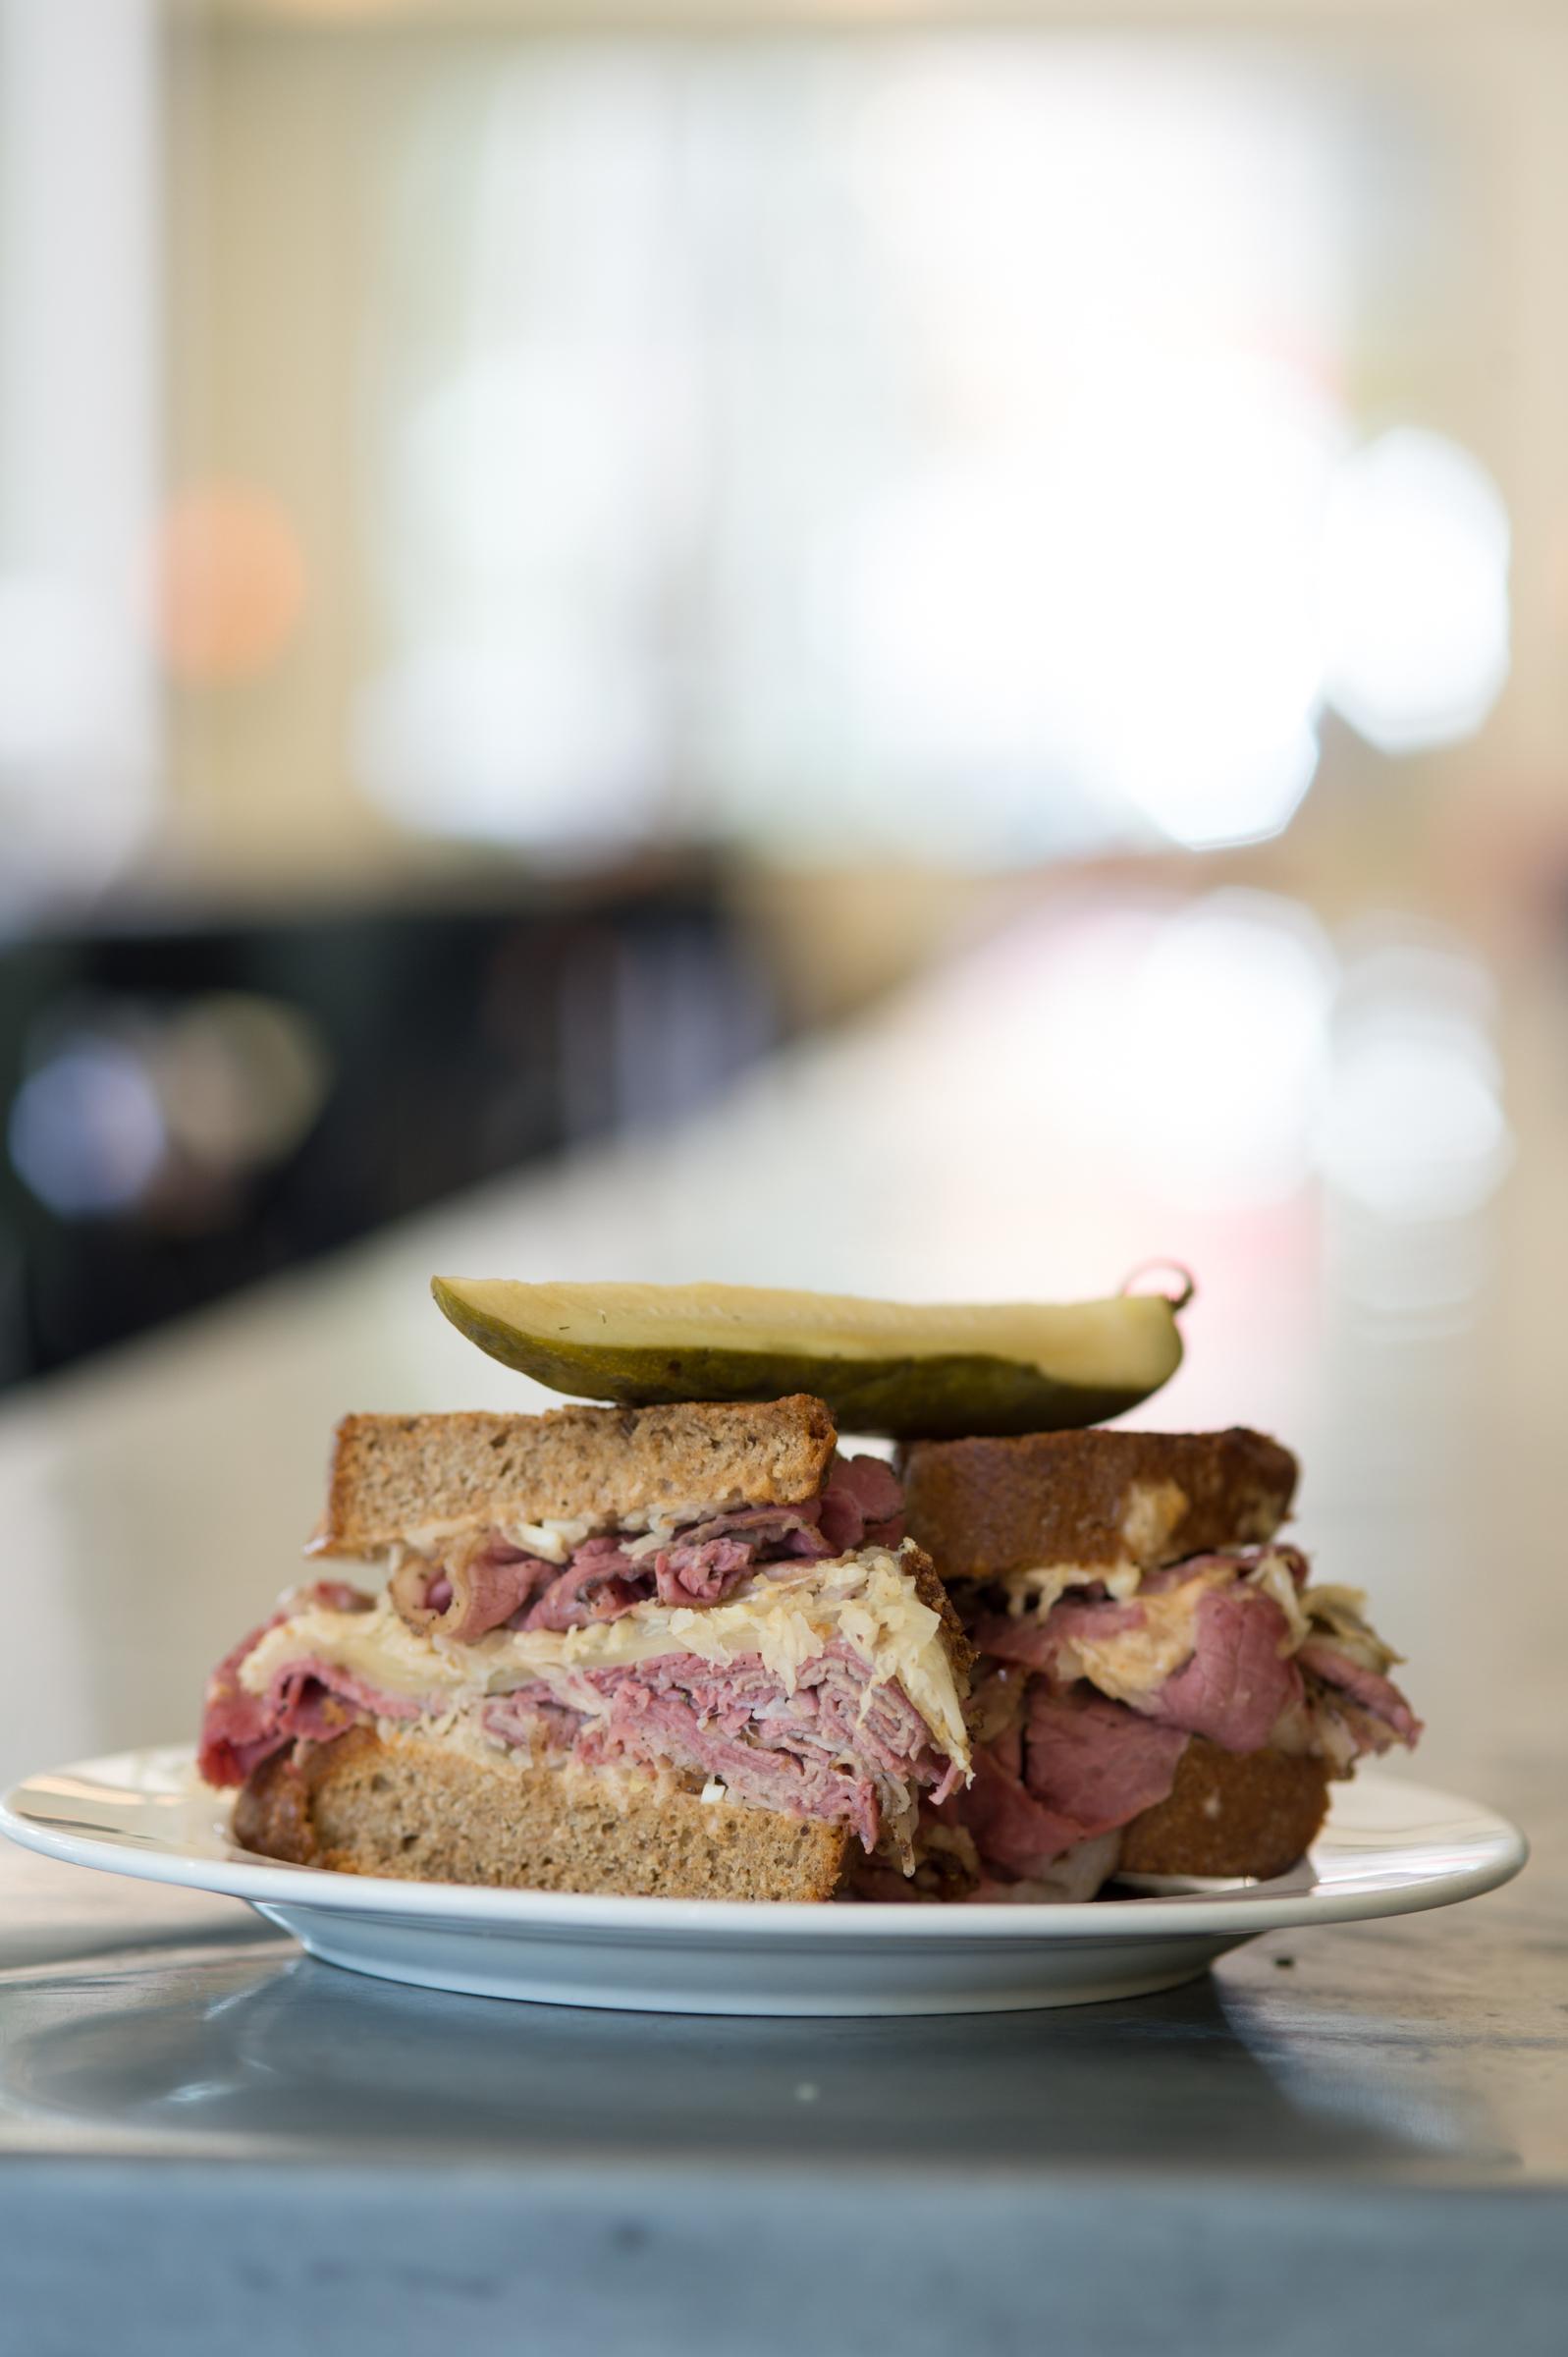 The pastrami sandwich at The Blackbird